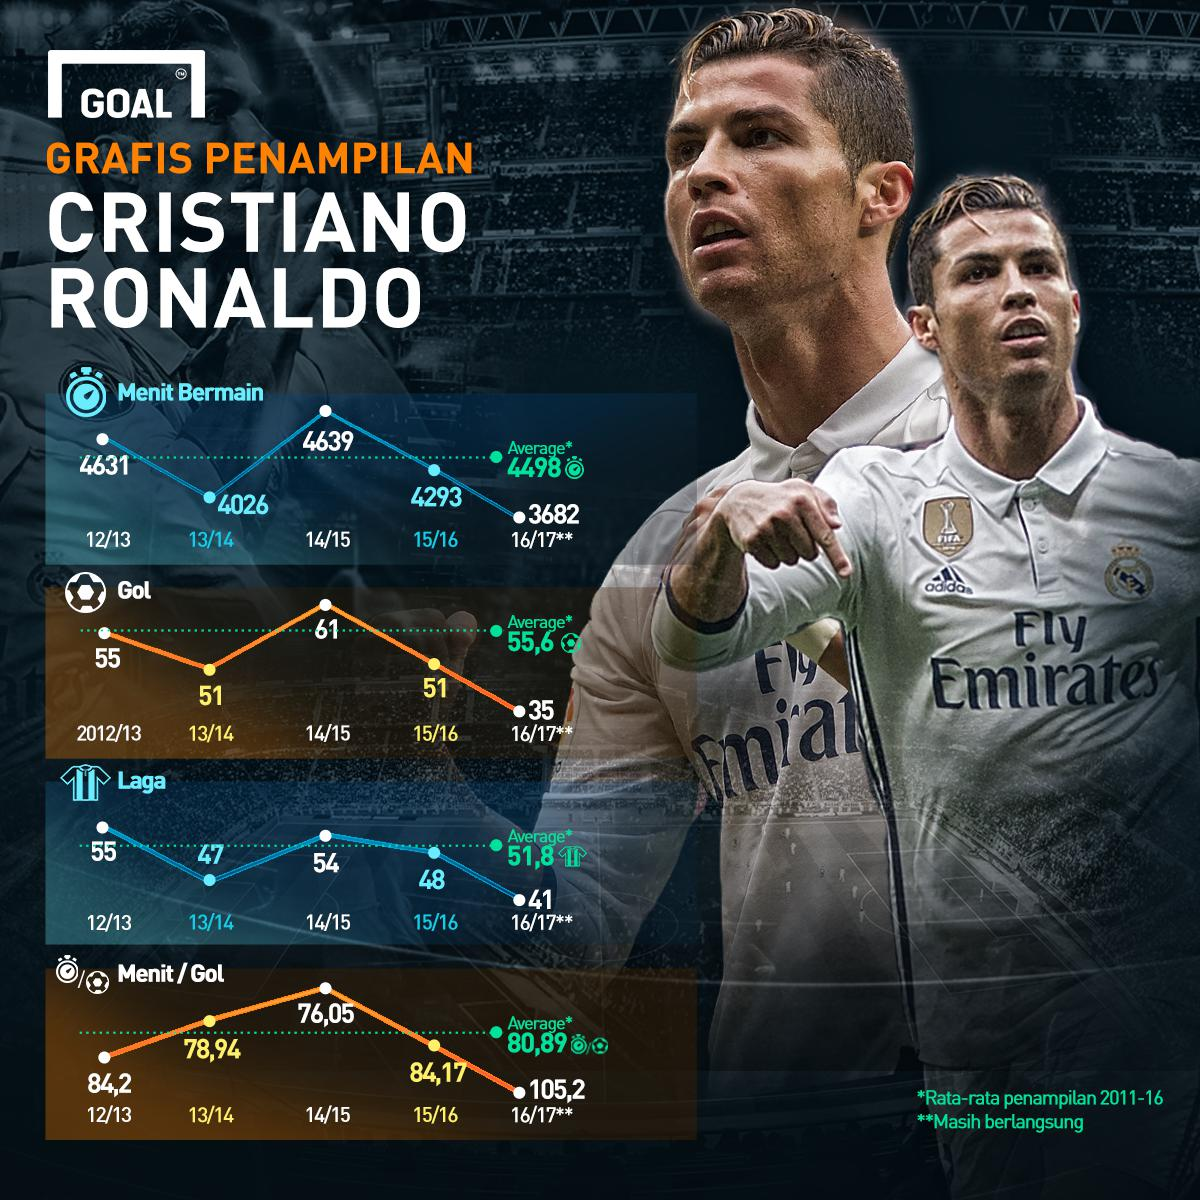 GFXID - Grafis Penampilan Cristiano Ronaldo